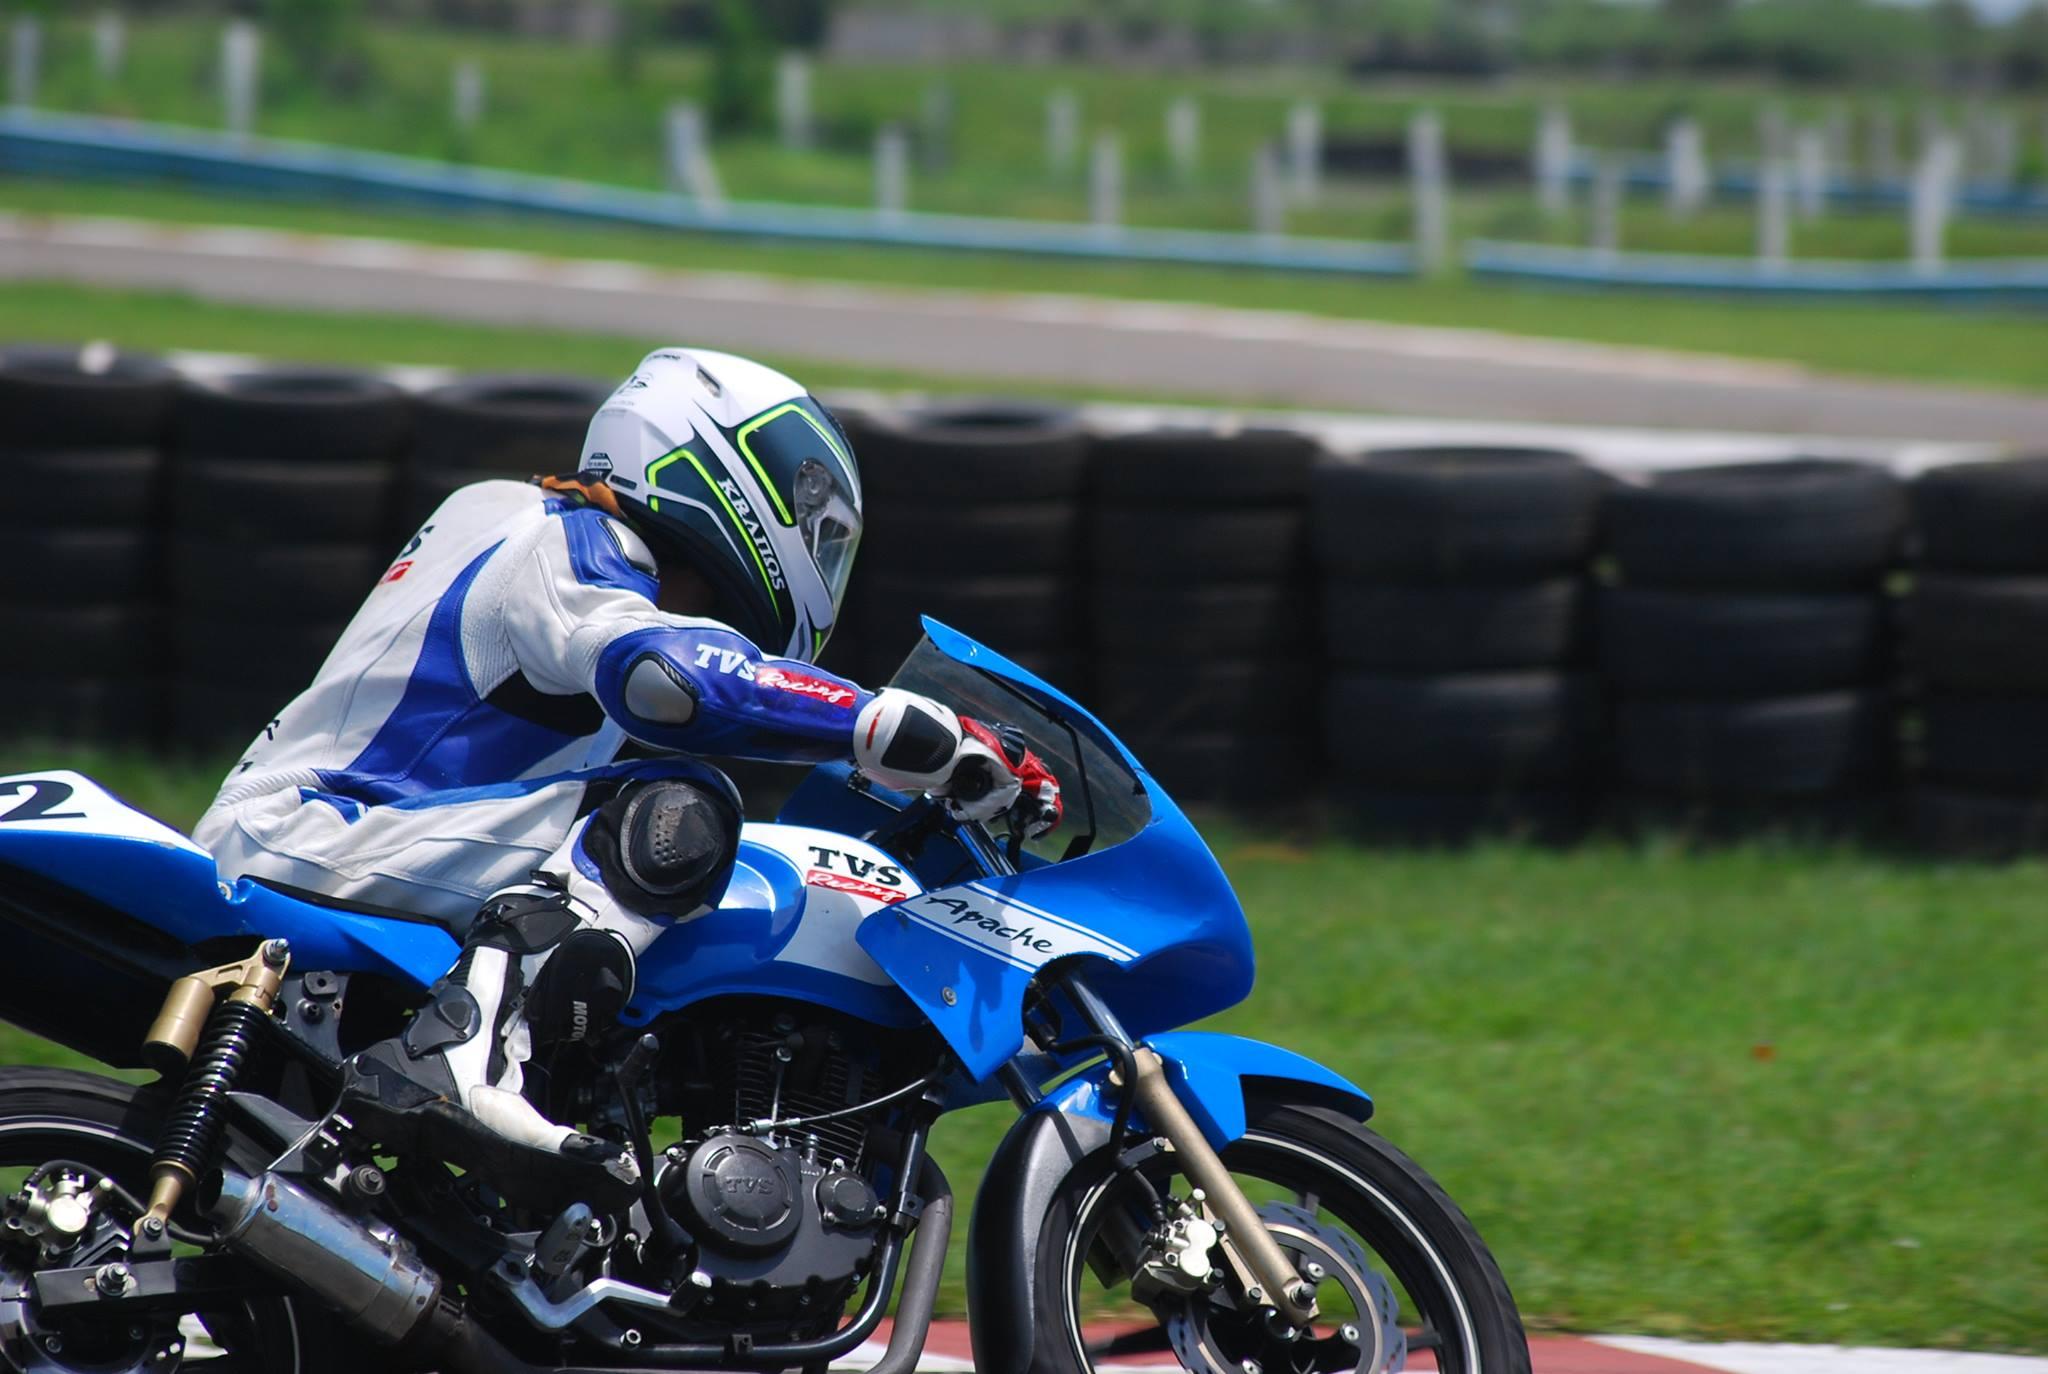 motor racing udipta 3